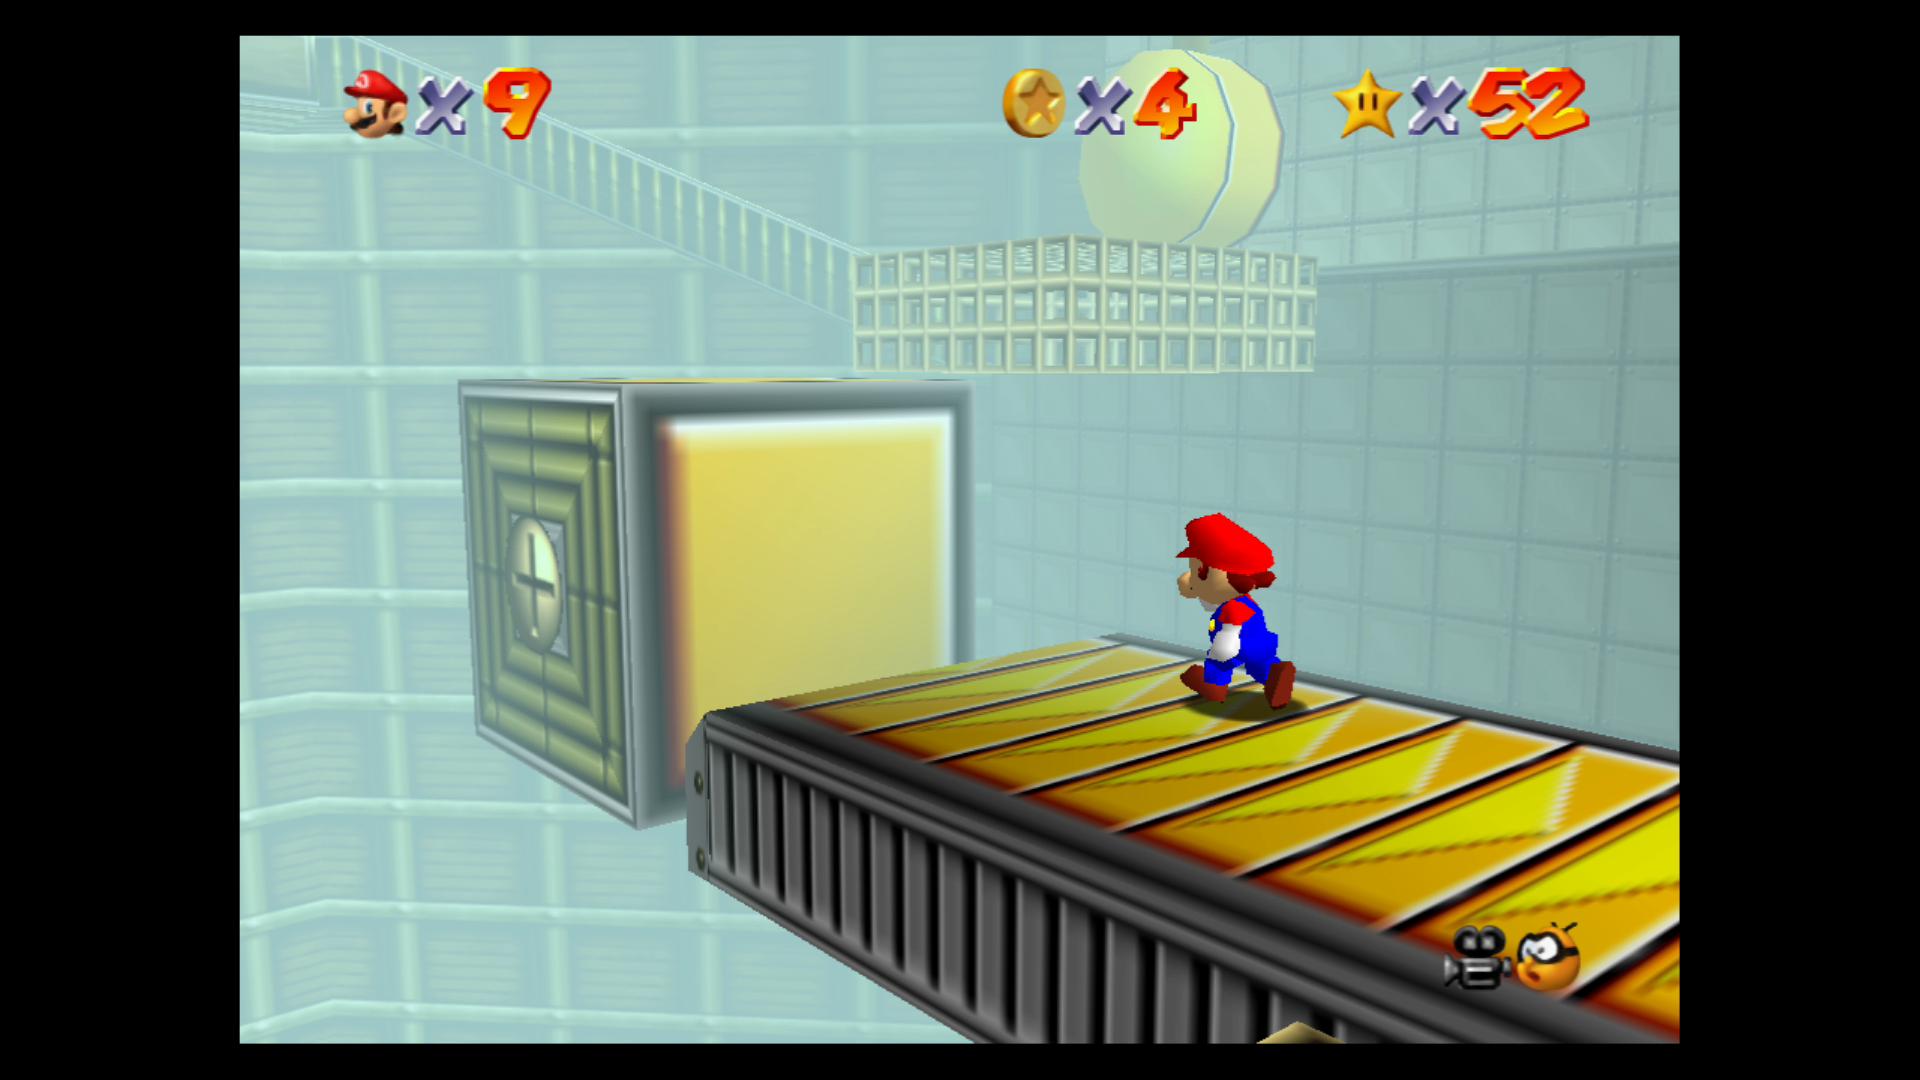 mario 64 tick tock clock Super Mario 64: Tick Tock Clock Stars